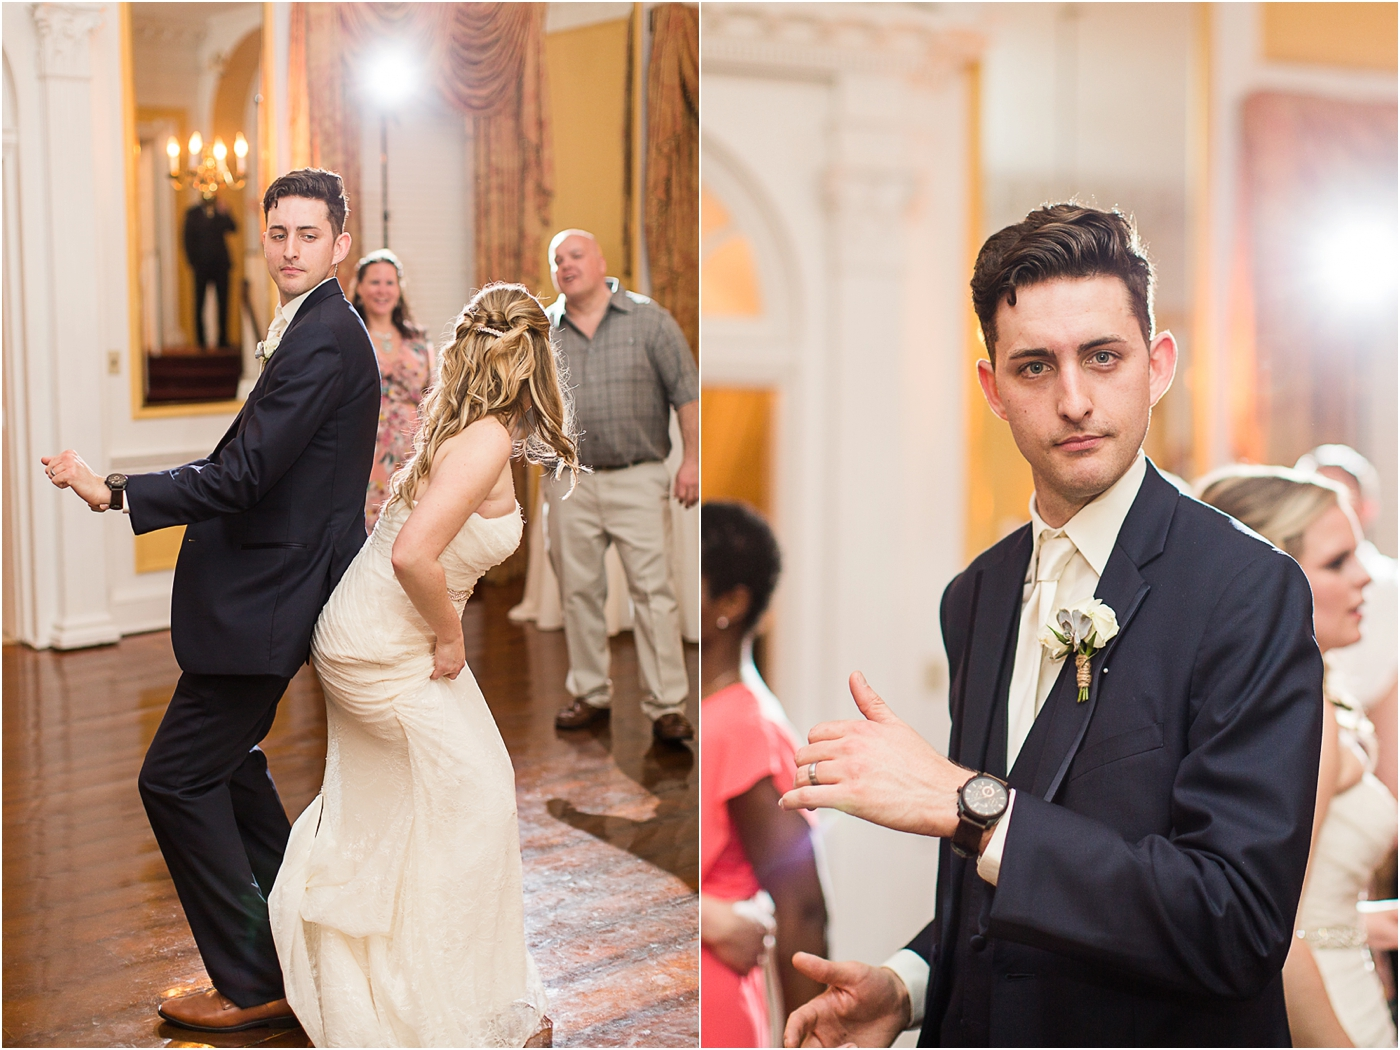 Greyrock-mansion-wedding-114.jpg